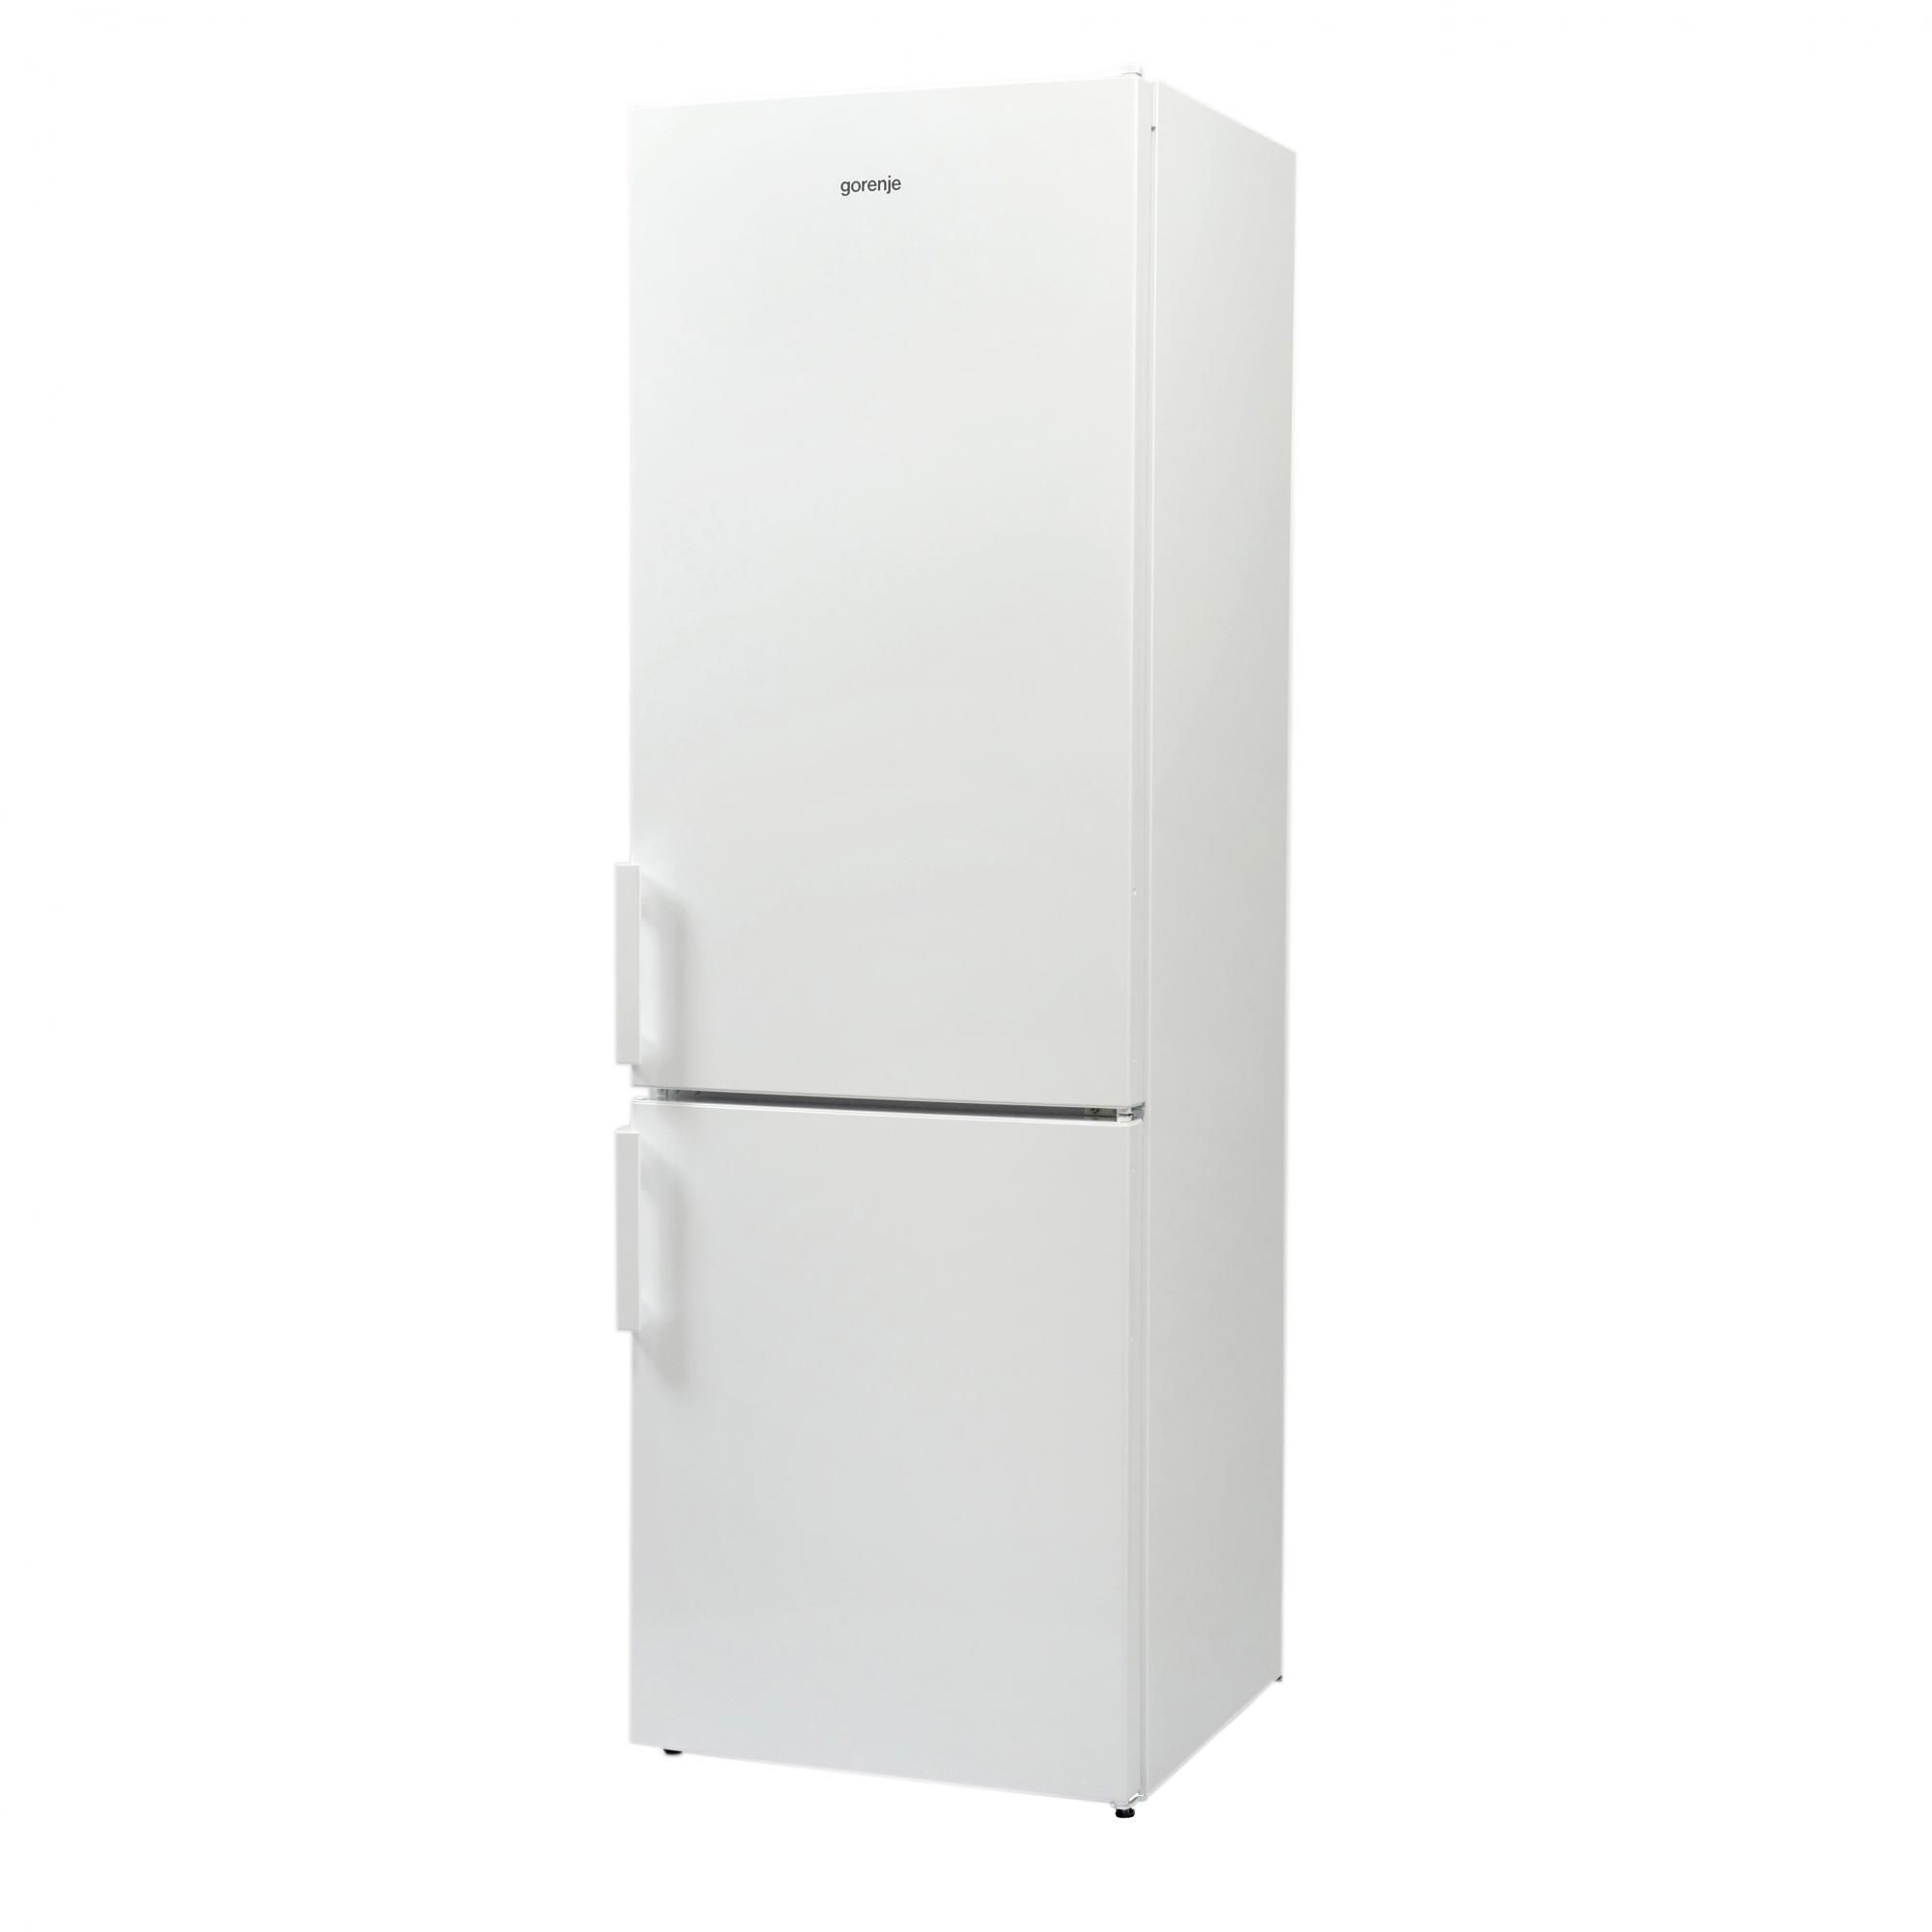 Хладилник с фризер Gorenje RK6191AW, 321 л, Клас A+, H 185 см, Бял